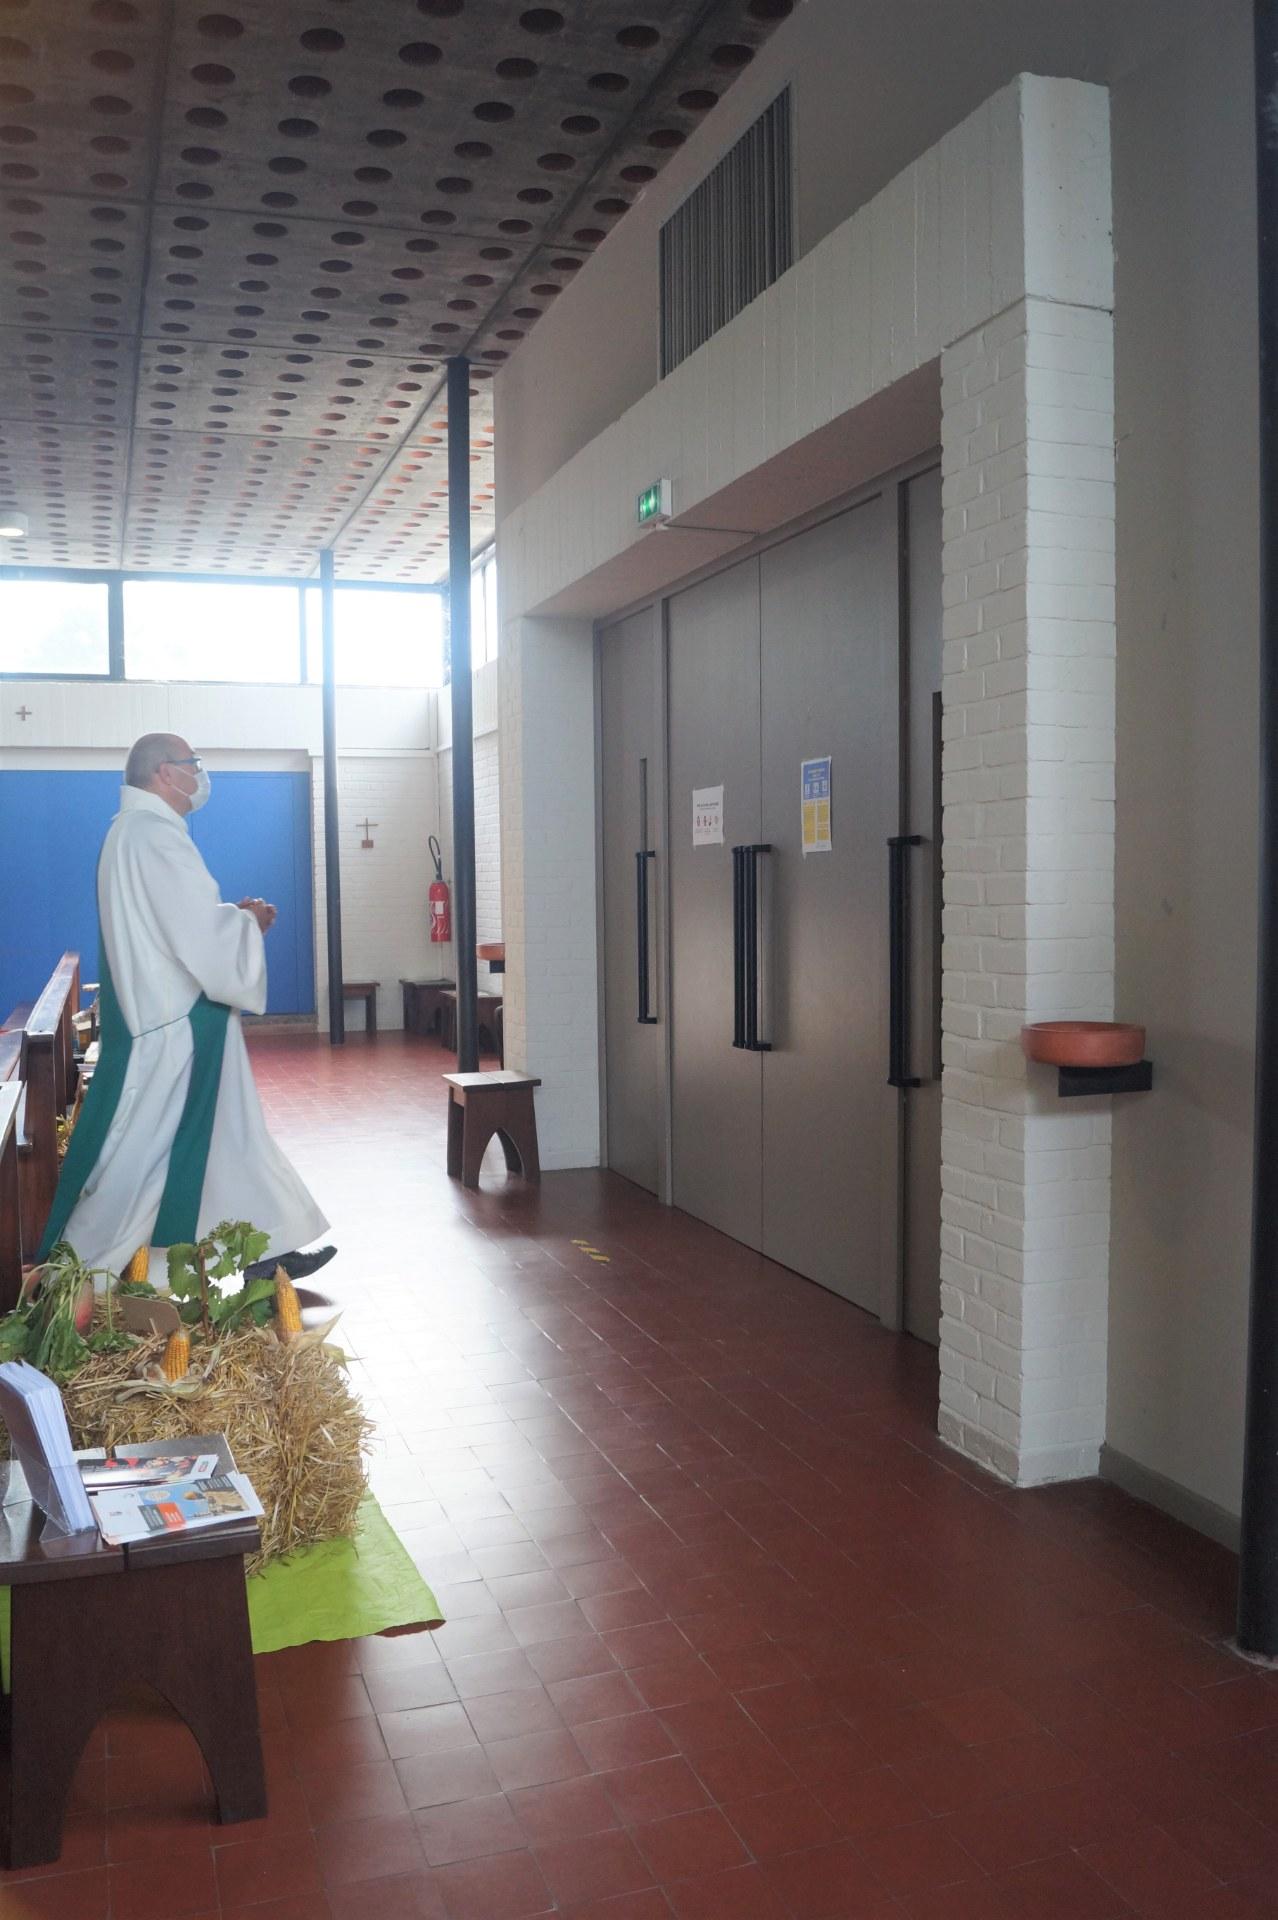 entree en catechumenat 6 sept 2020 (6)